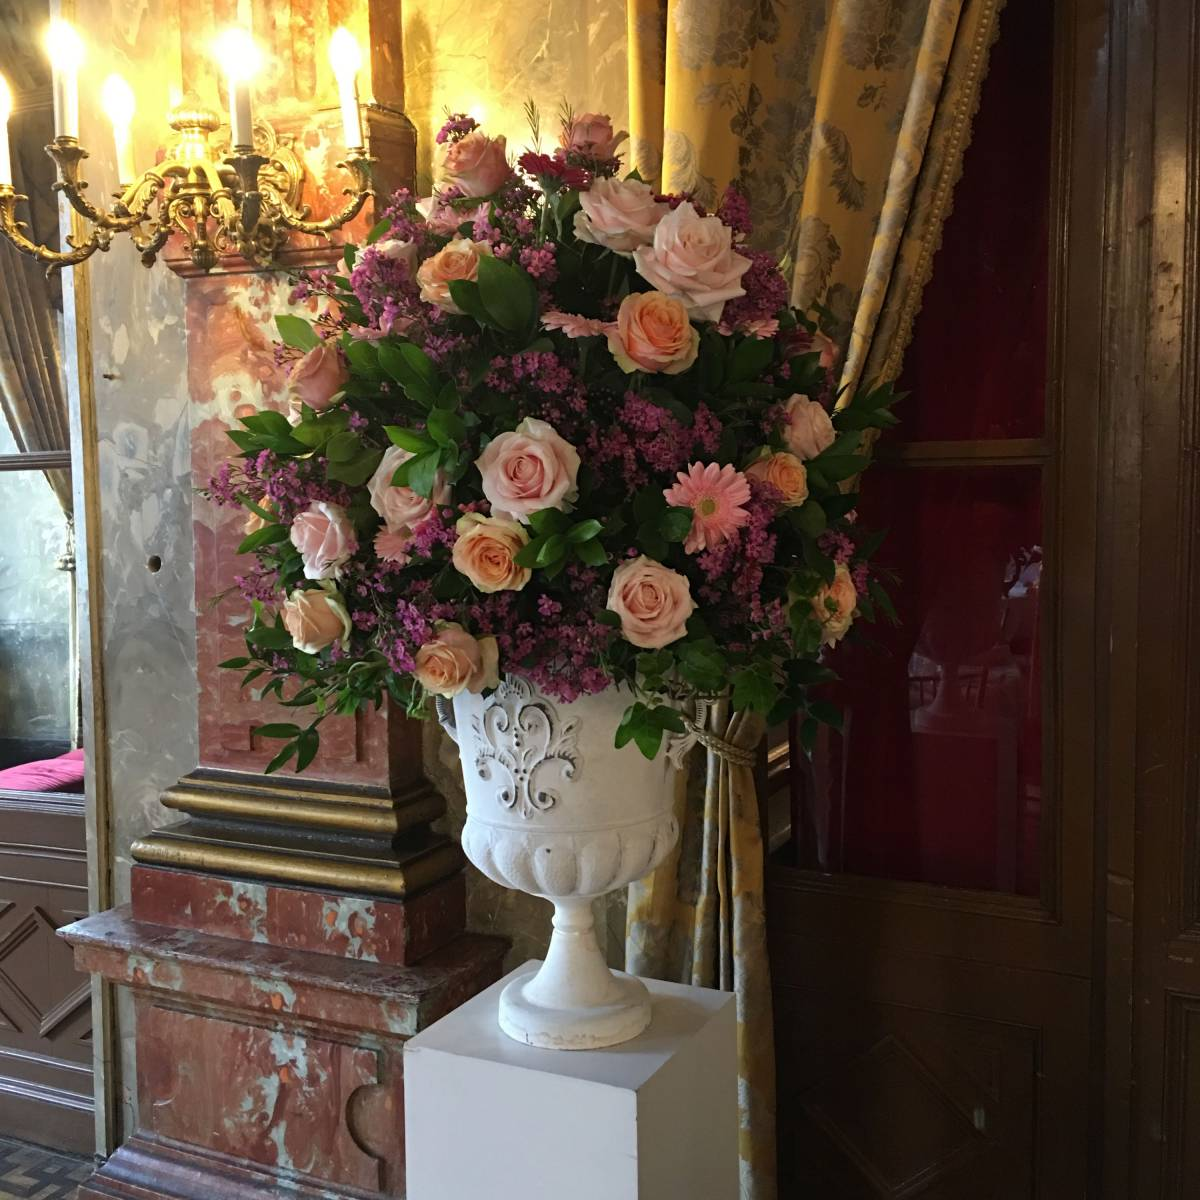 Maison Fleurie - Fotograaf zelfgetrokken - House of Weddings - 3